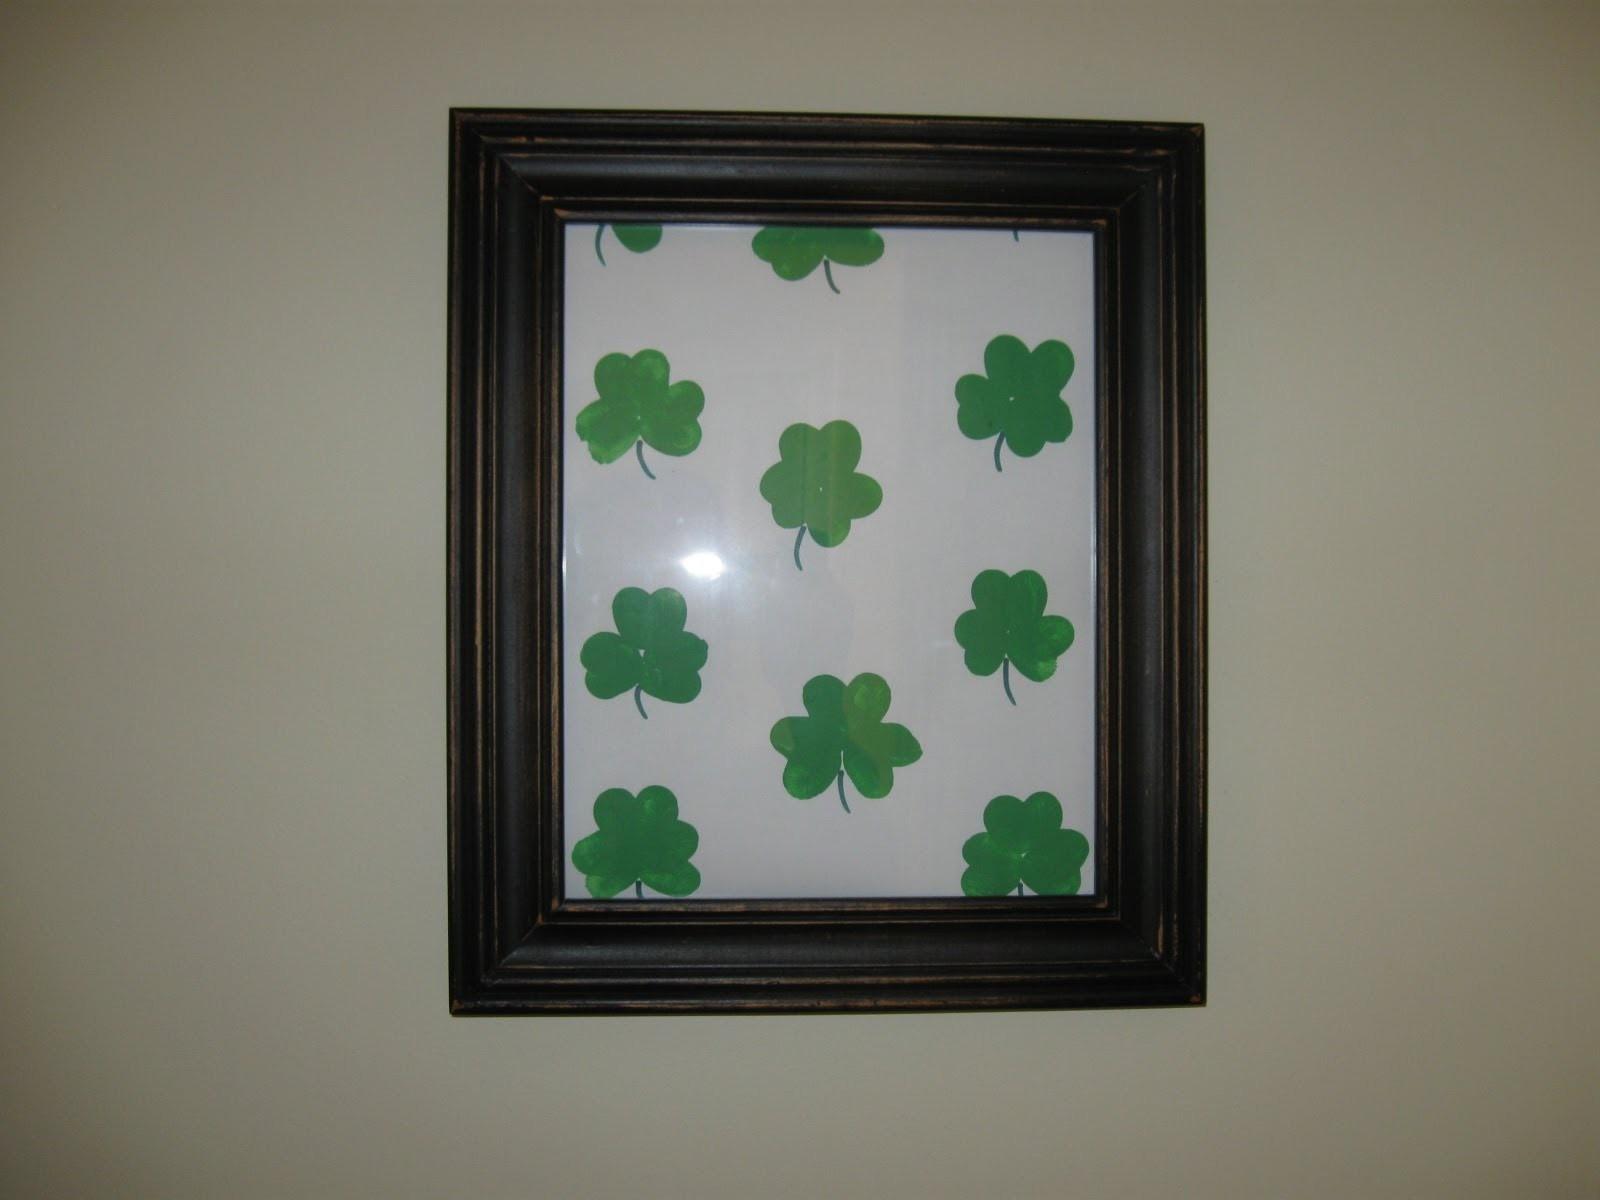 St. Patrick's Day Shamrock Artwork Craft Tutorial